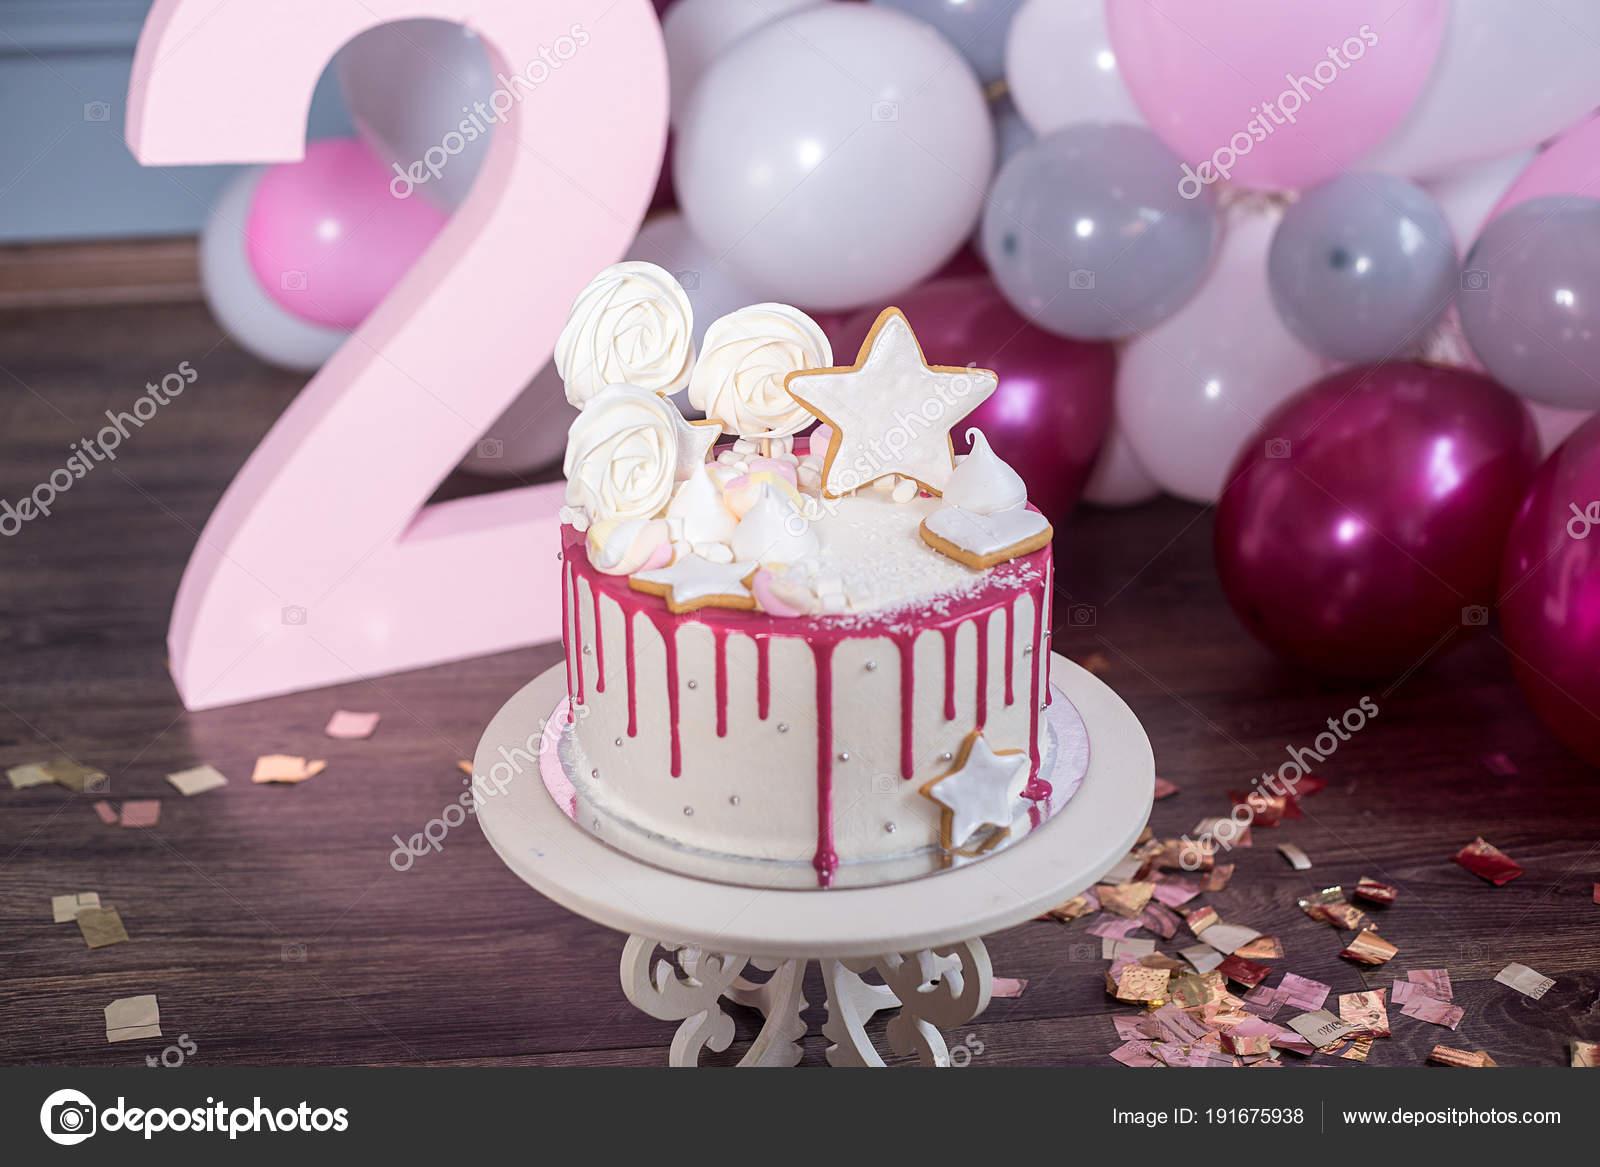 Terrific Images Birthday Cake Beautiful Delicious Beautiful Birthday Birthday Cards Printable Riciscafe Filternl